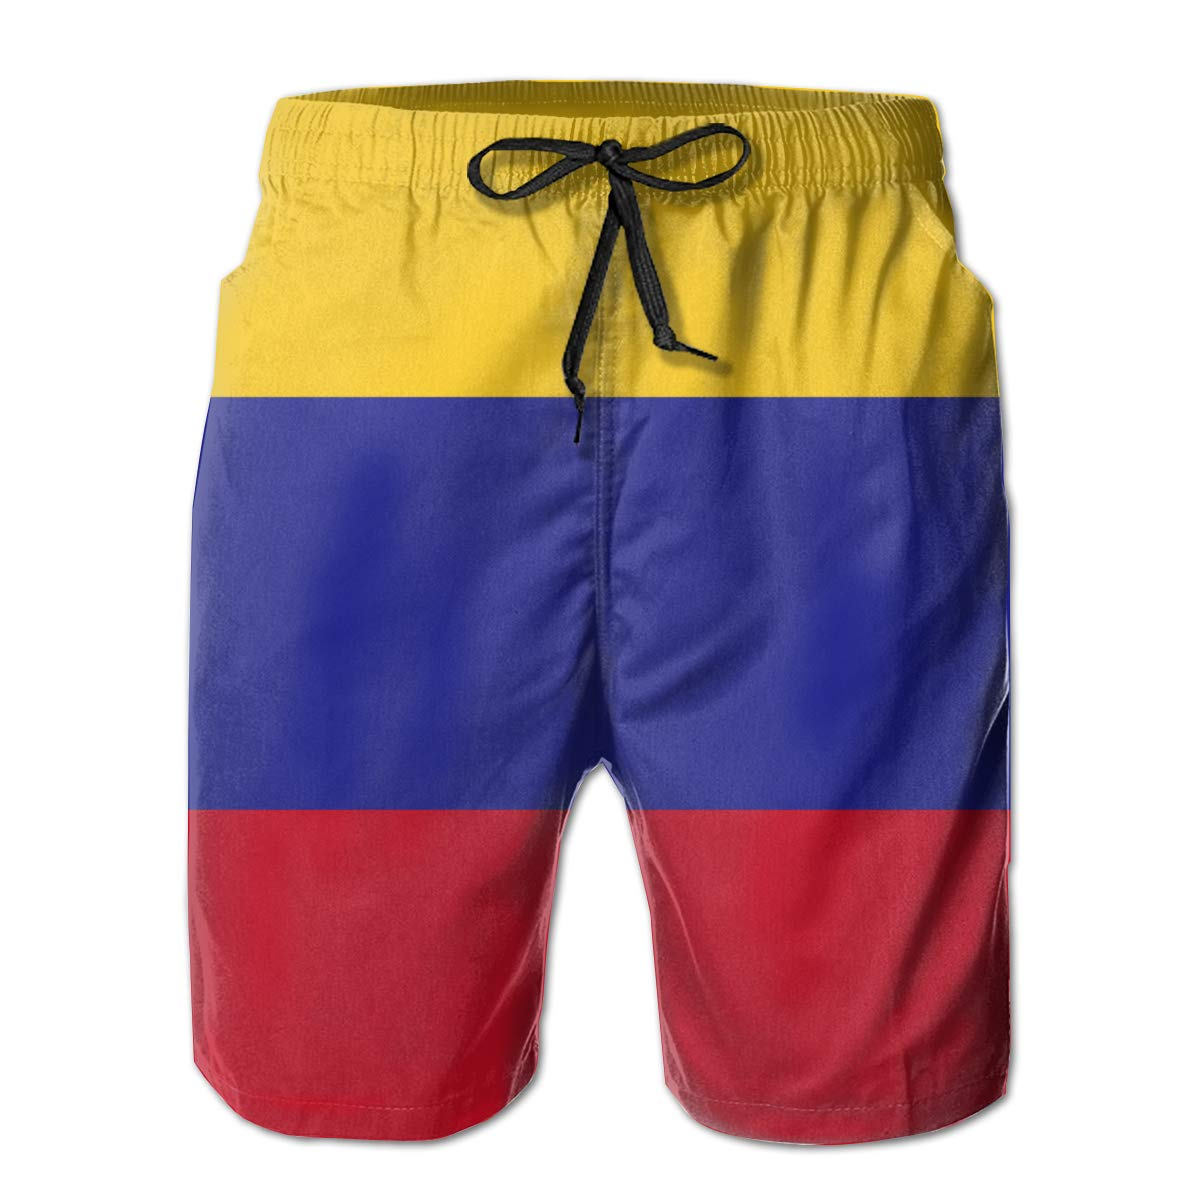 Mens 3D Printed Swim Trunks Quick Dry Summer Surf Board Shorts Swimwear Pants